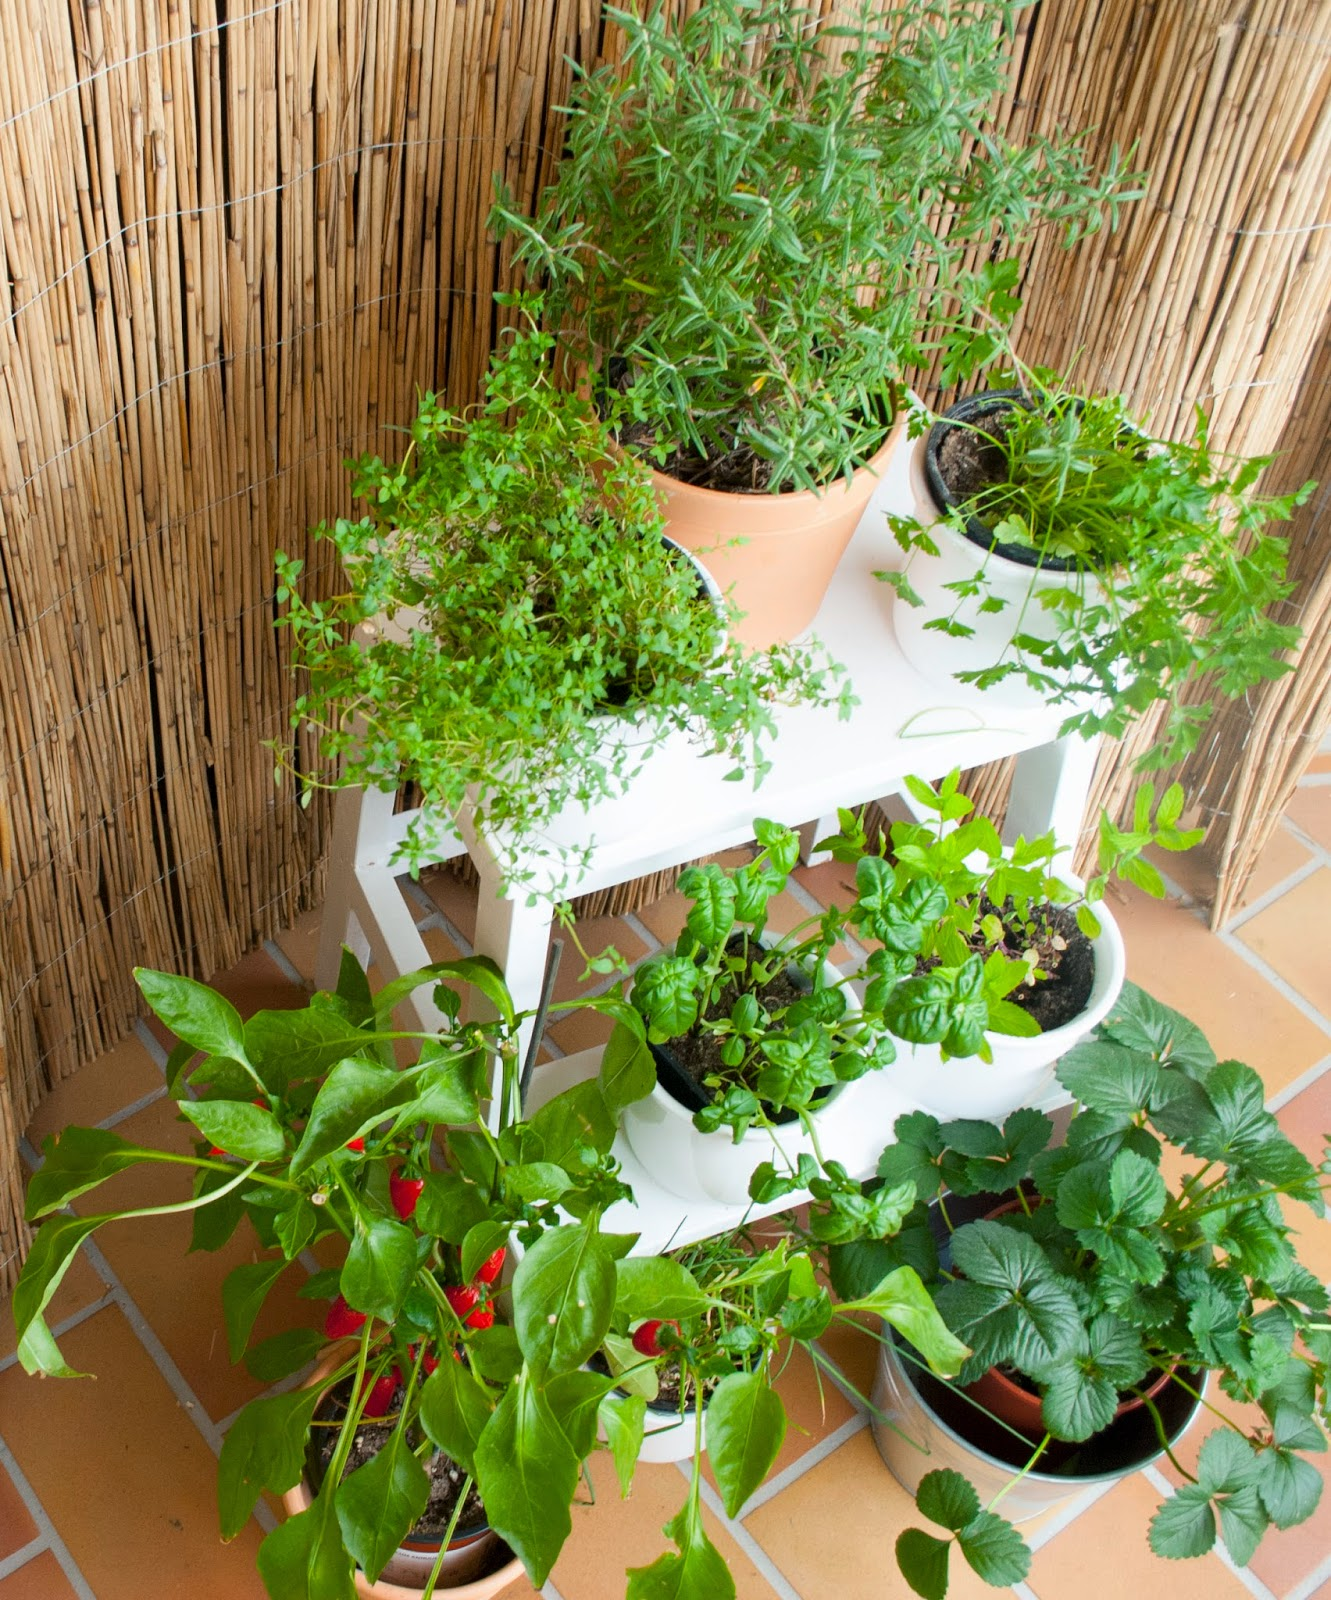 Bekväm IKEA mehr als ein Leben Balkon Outdoor Sommer 2014 Kräuter Basilikum Schnittlauch Petersilie Rosmarin Thymian Minze